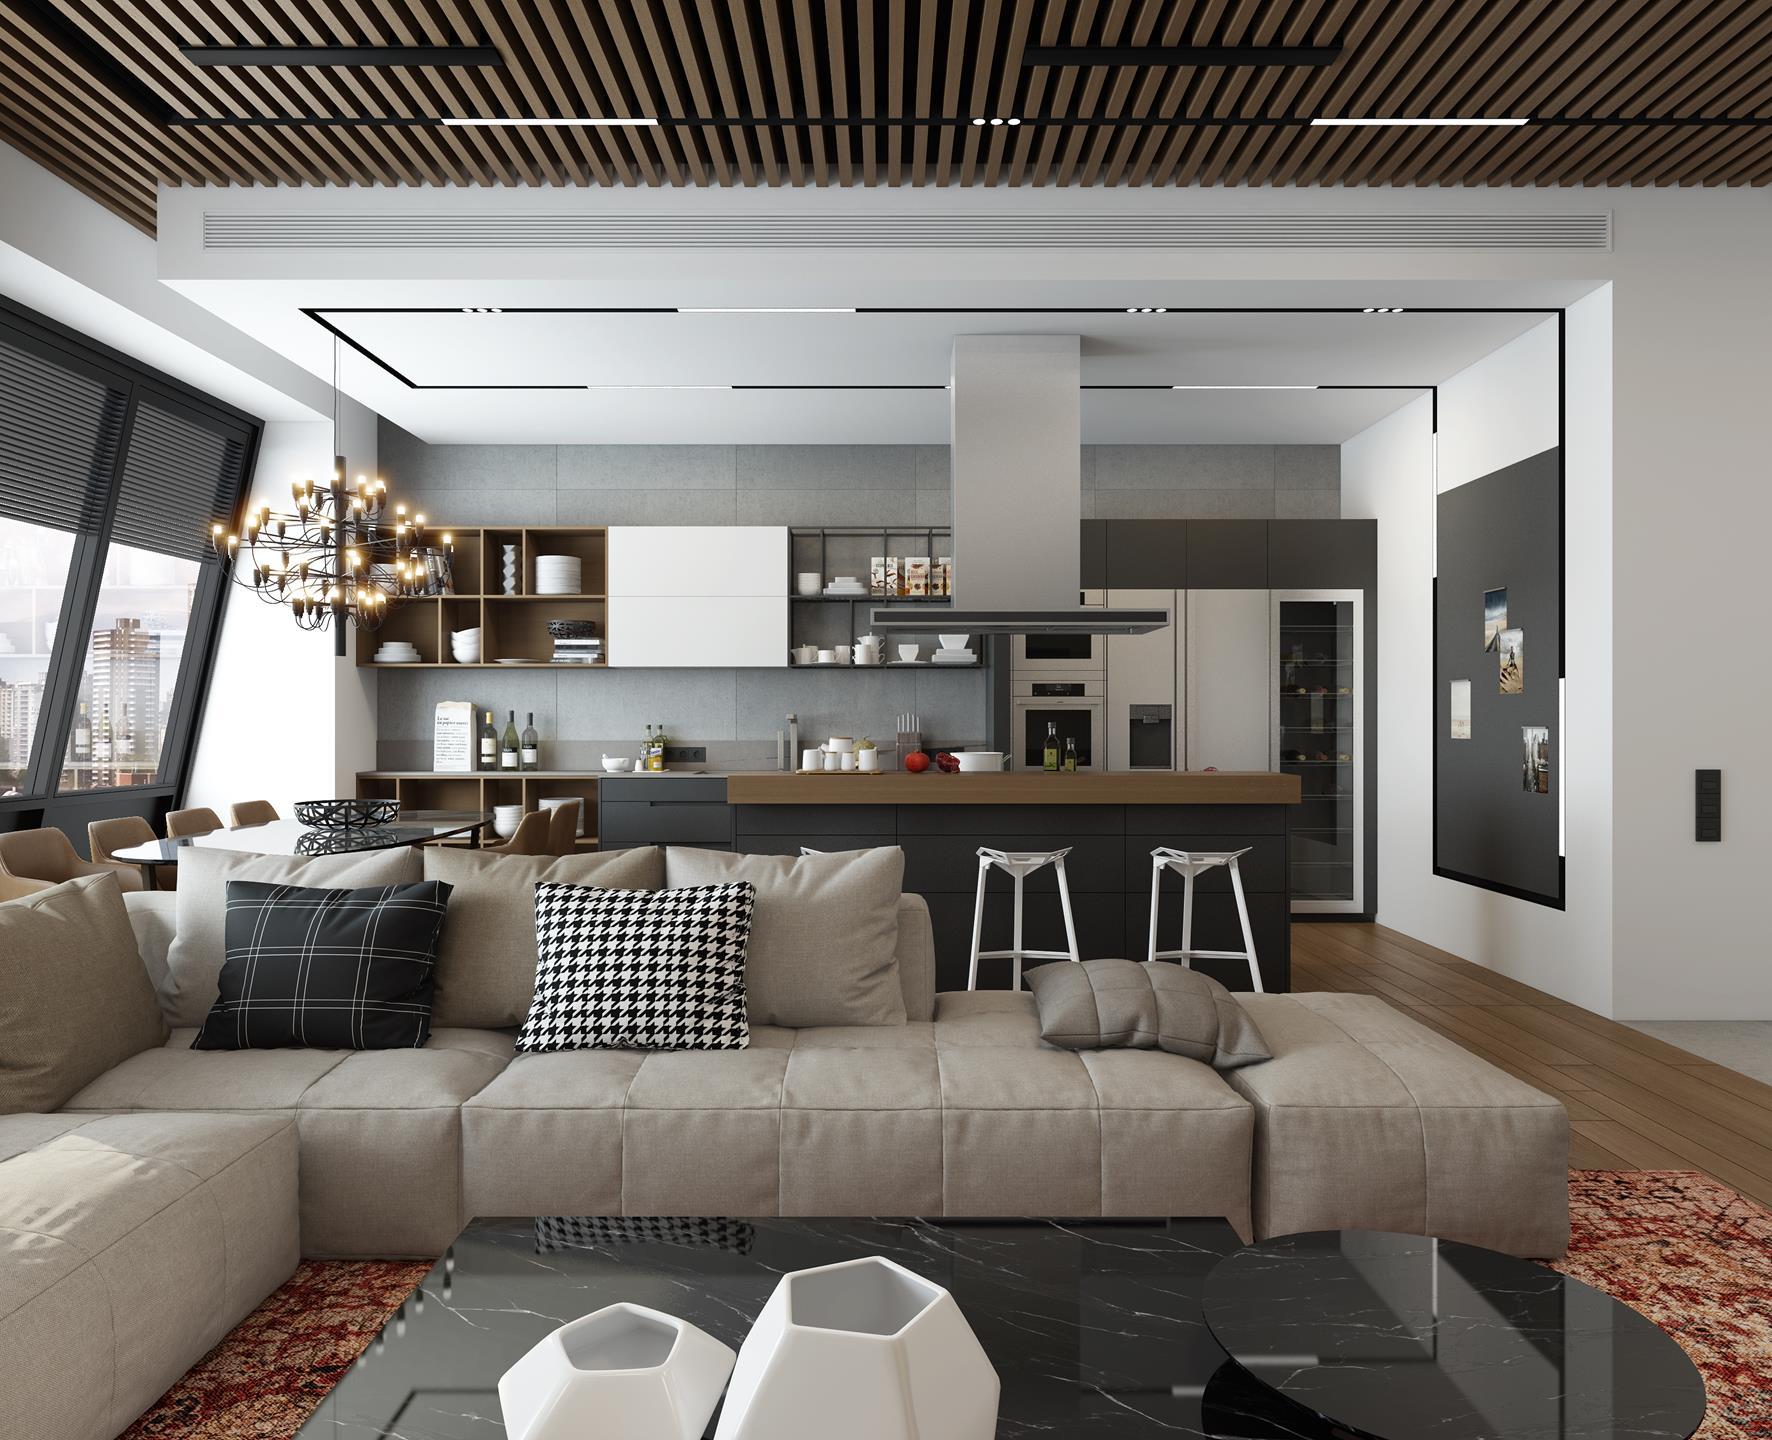 Дизайн трехкомнатной квартиры 170 кв. м.